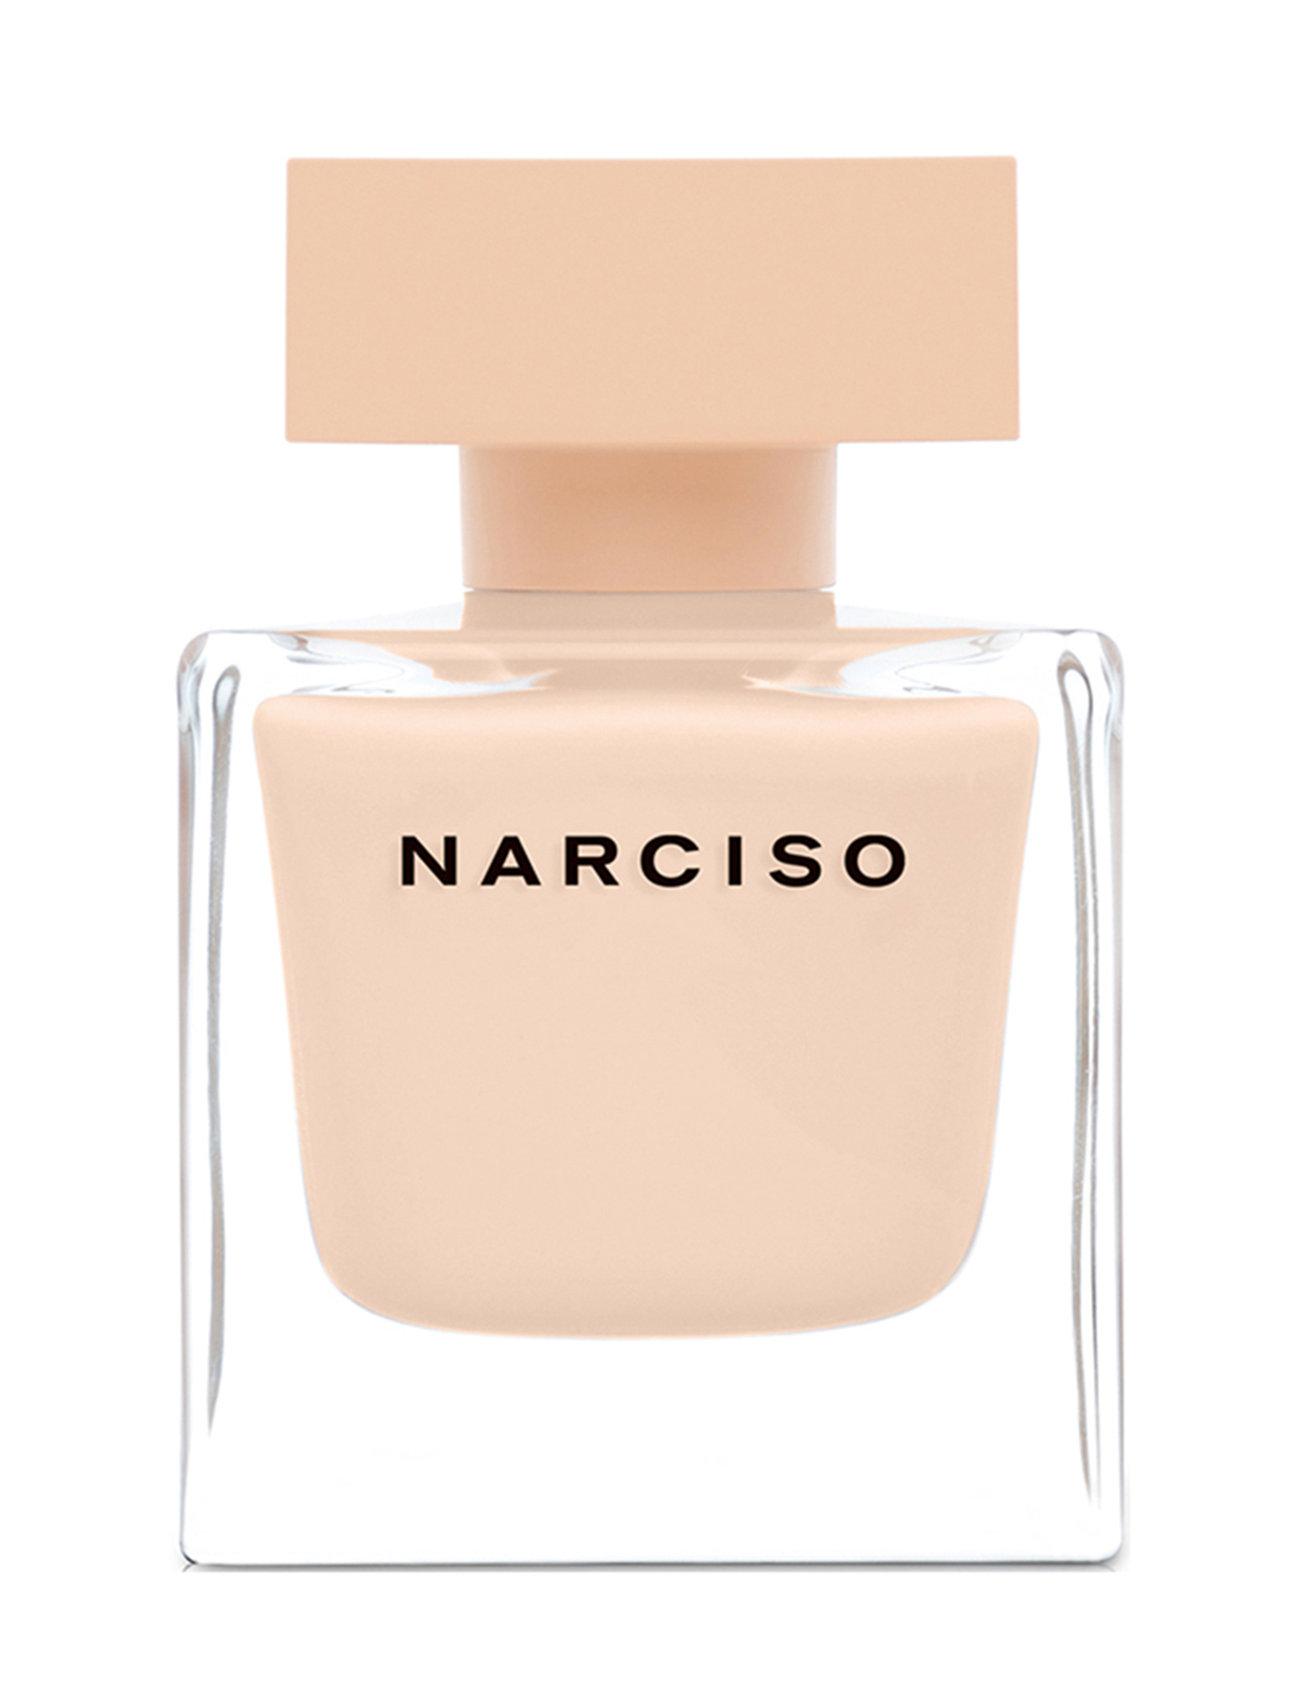 Narciso rodriguez narciso poudree e fra narciso rodriguez fra boozt.com dk